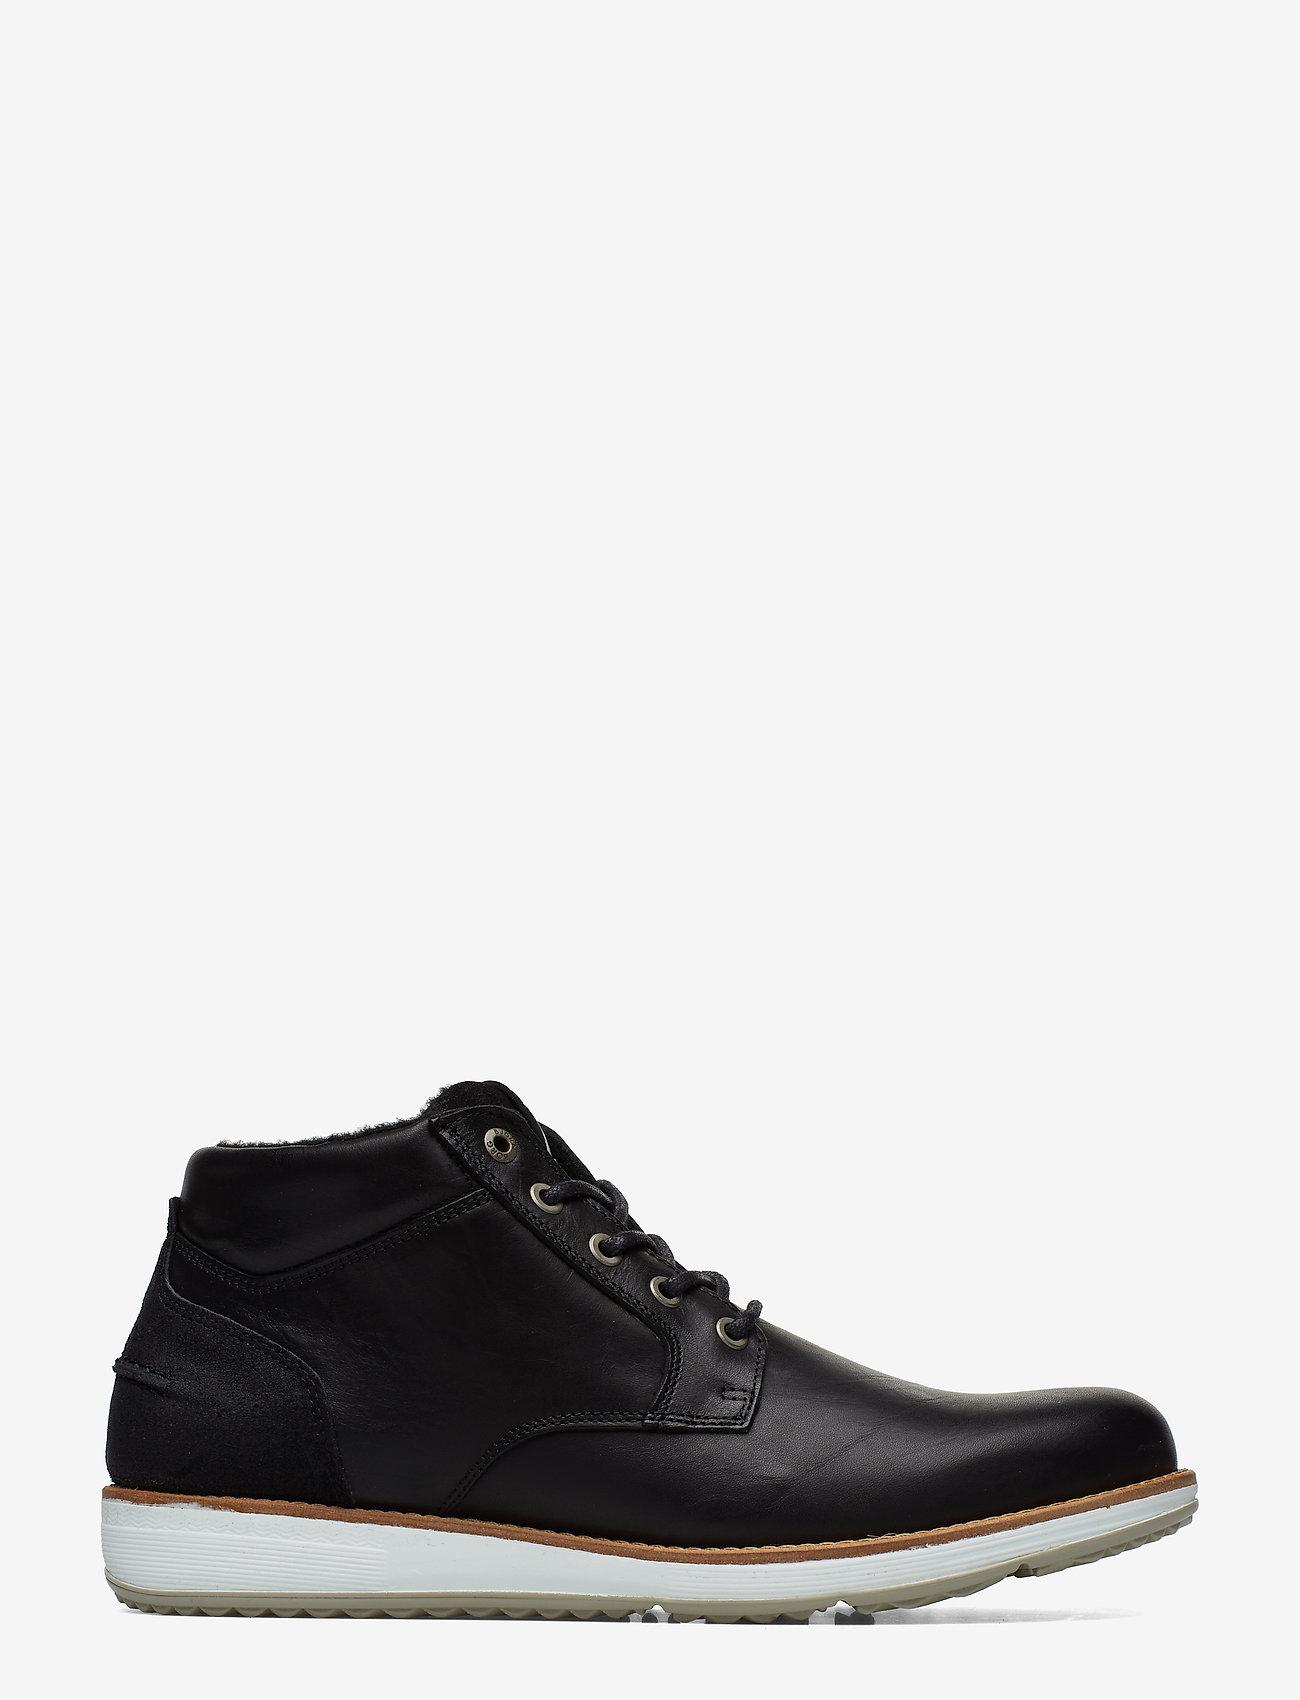 Björn Borg - SUNDAL MID M - laced boots - black - 1